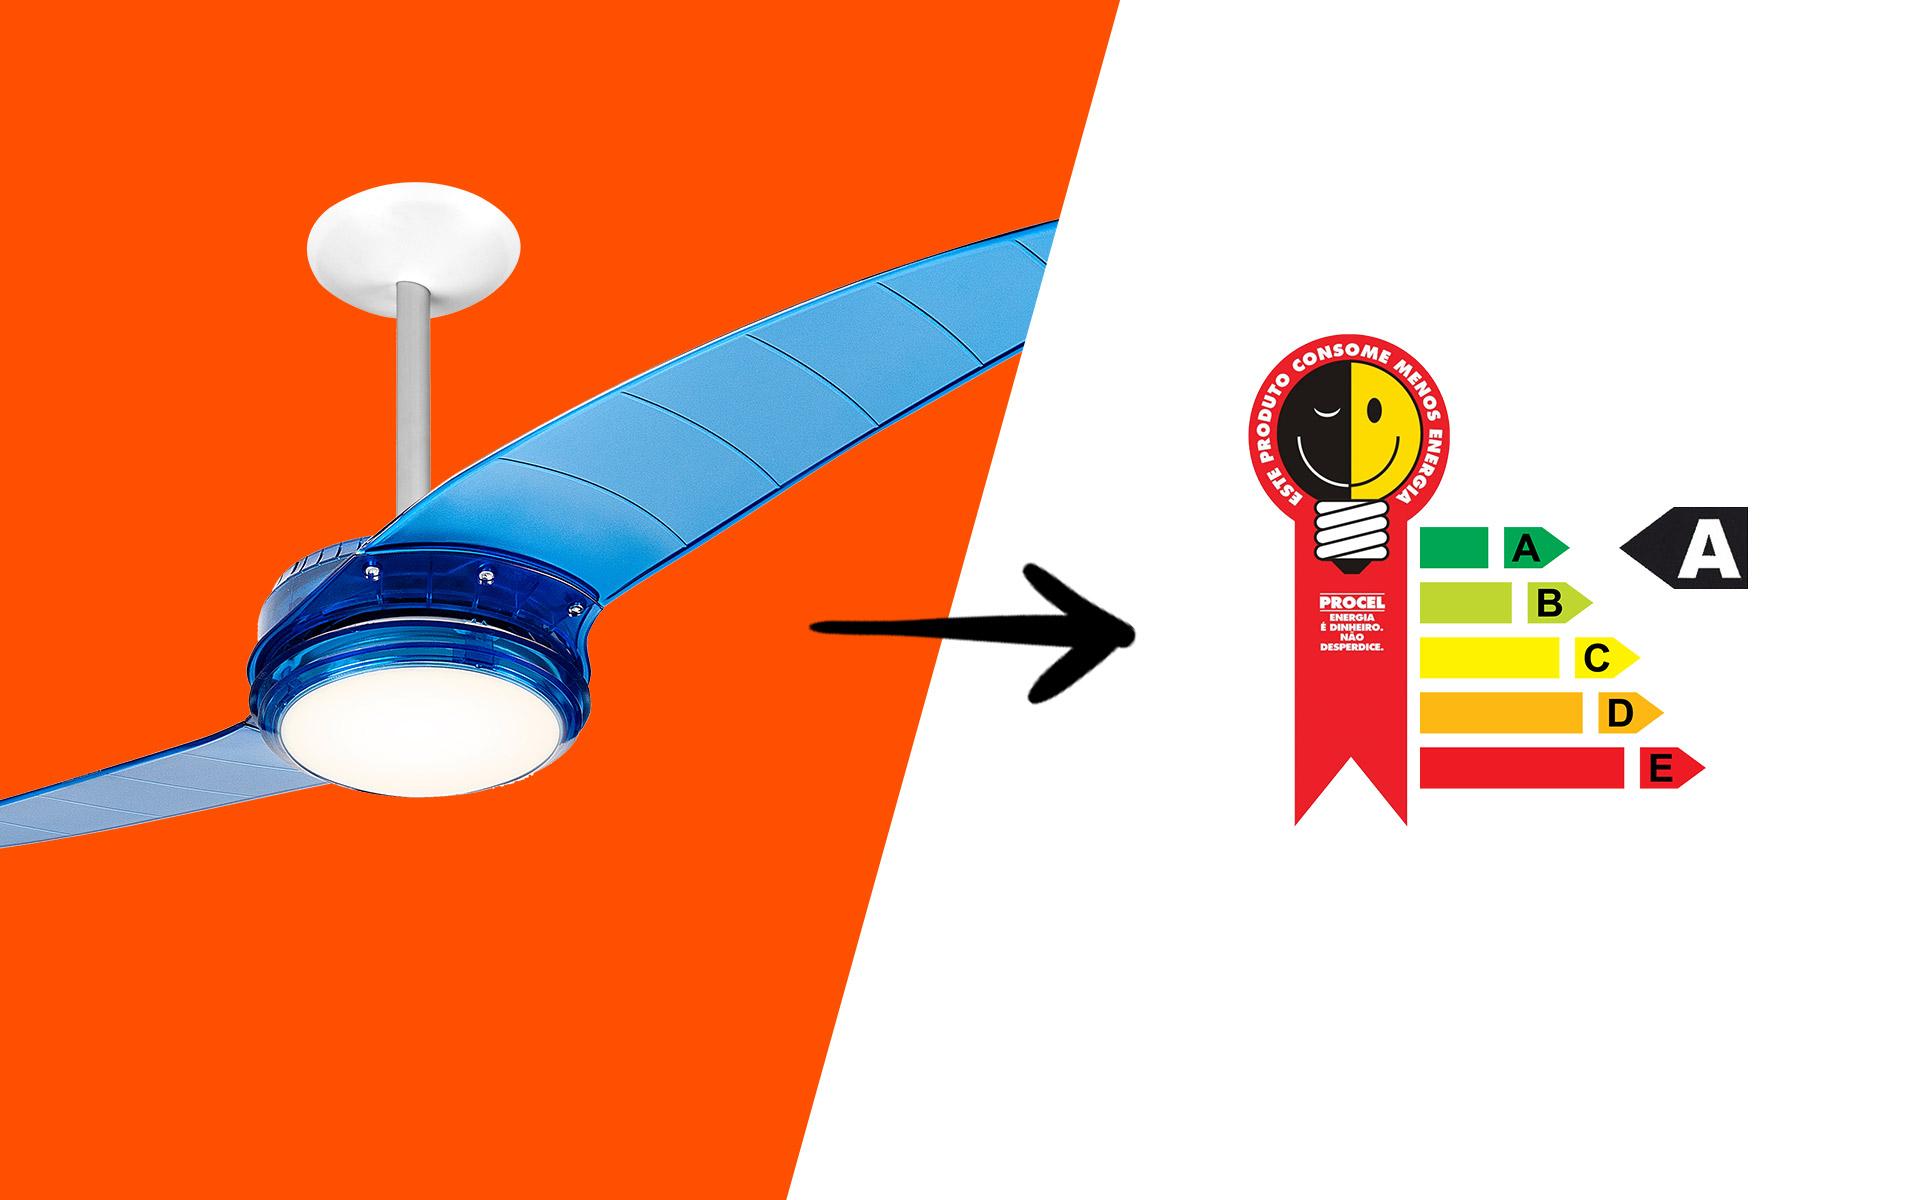 ventilador de teto Spirit - Blog Myspirit - capa blog - consumo de energia do ventilador de teto